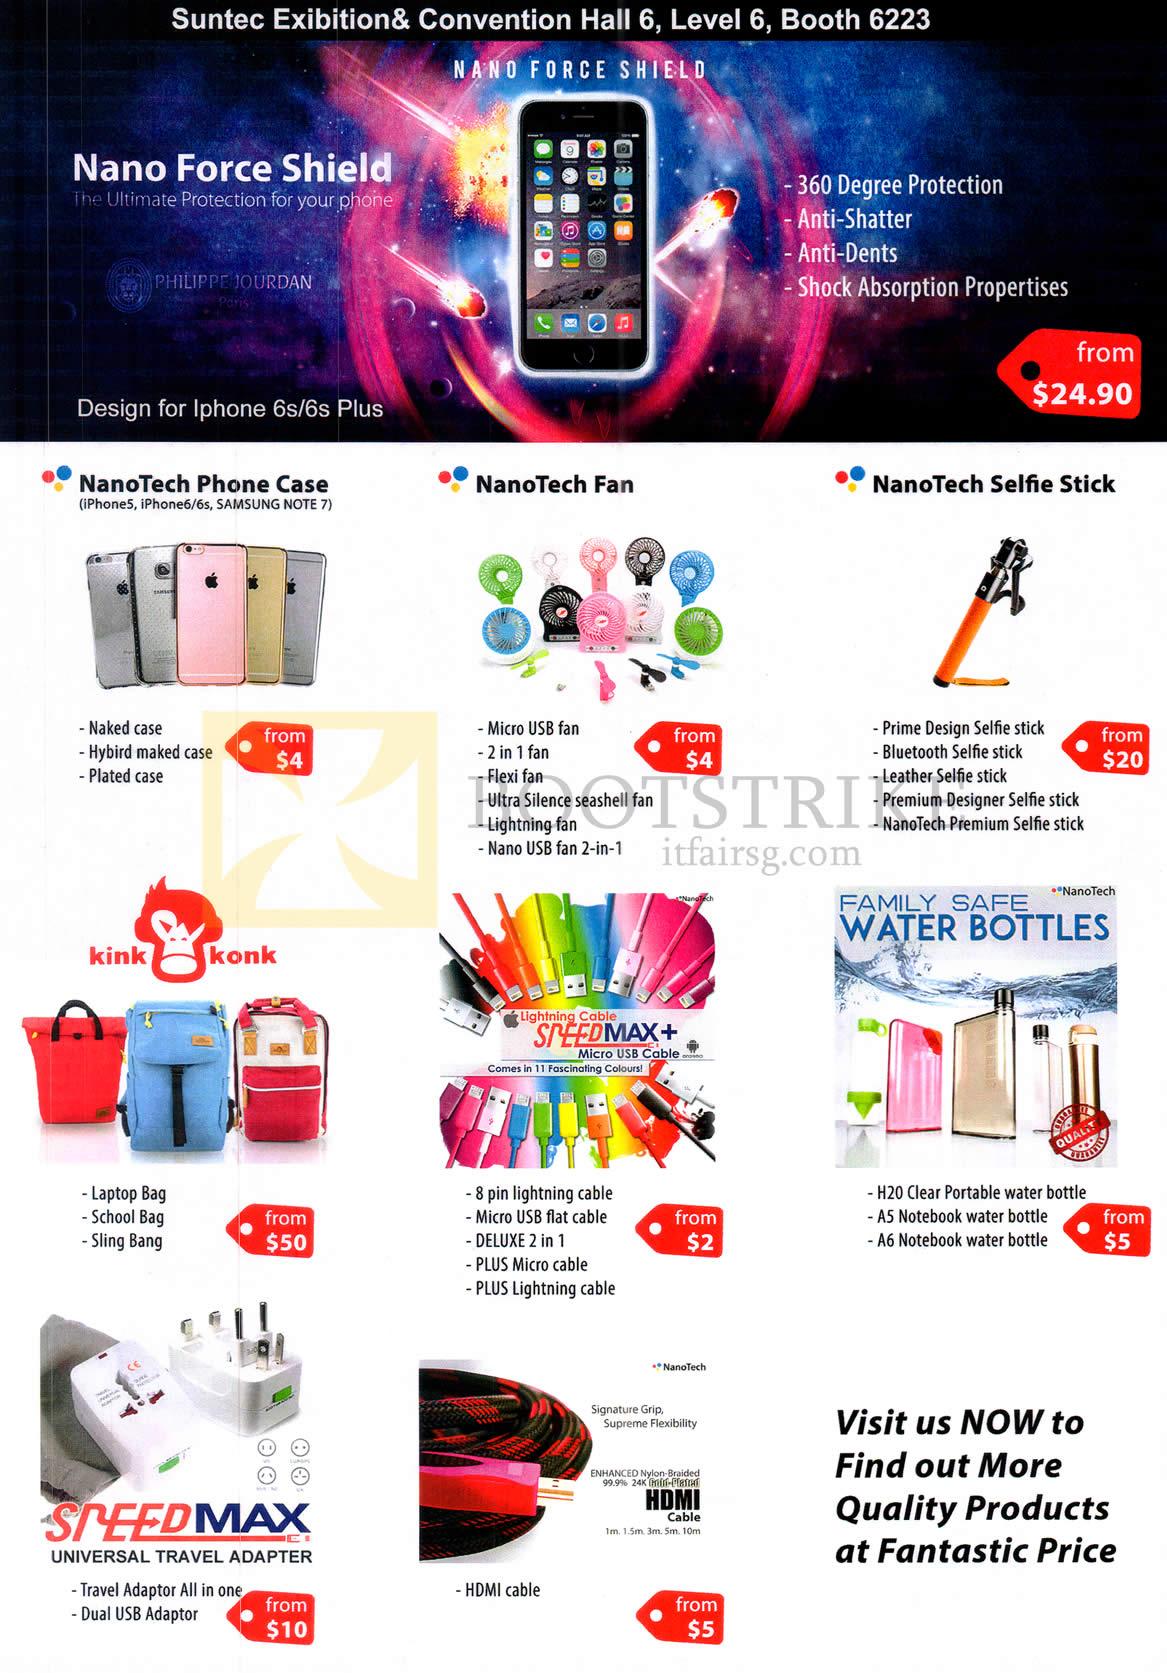 COMEX 2016 price list image brochure of Philippie Jourdan Phone Case, NanoTech Fan, Selfie Stick, Lightning Cables, Water Bottles, Adapter